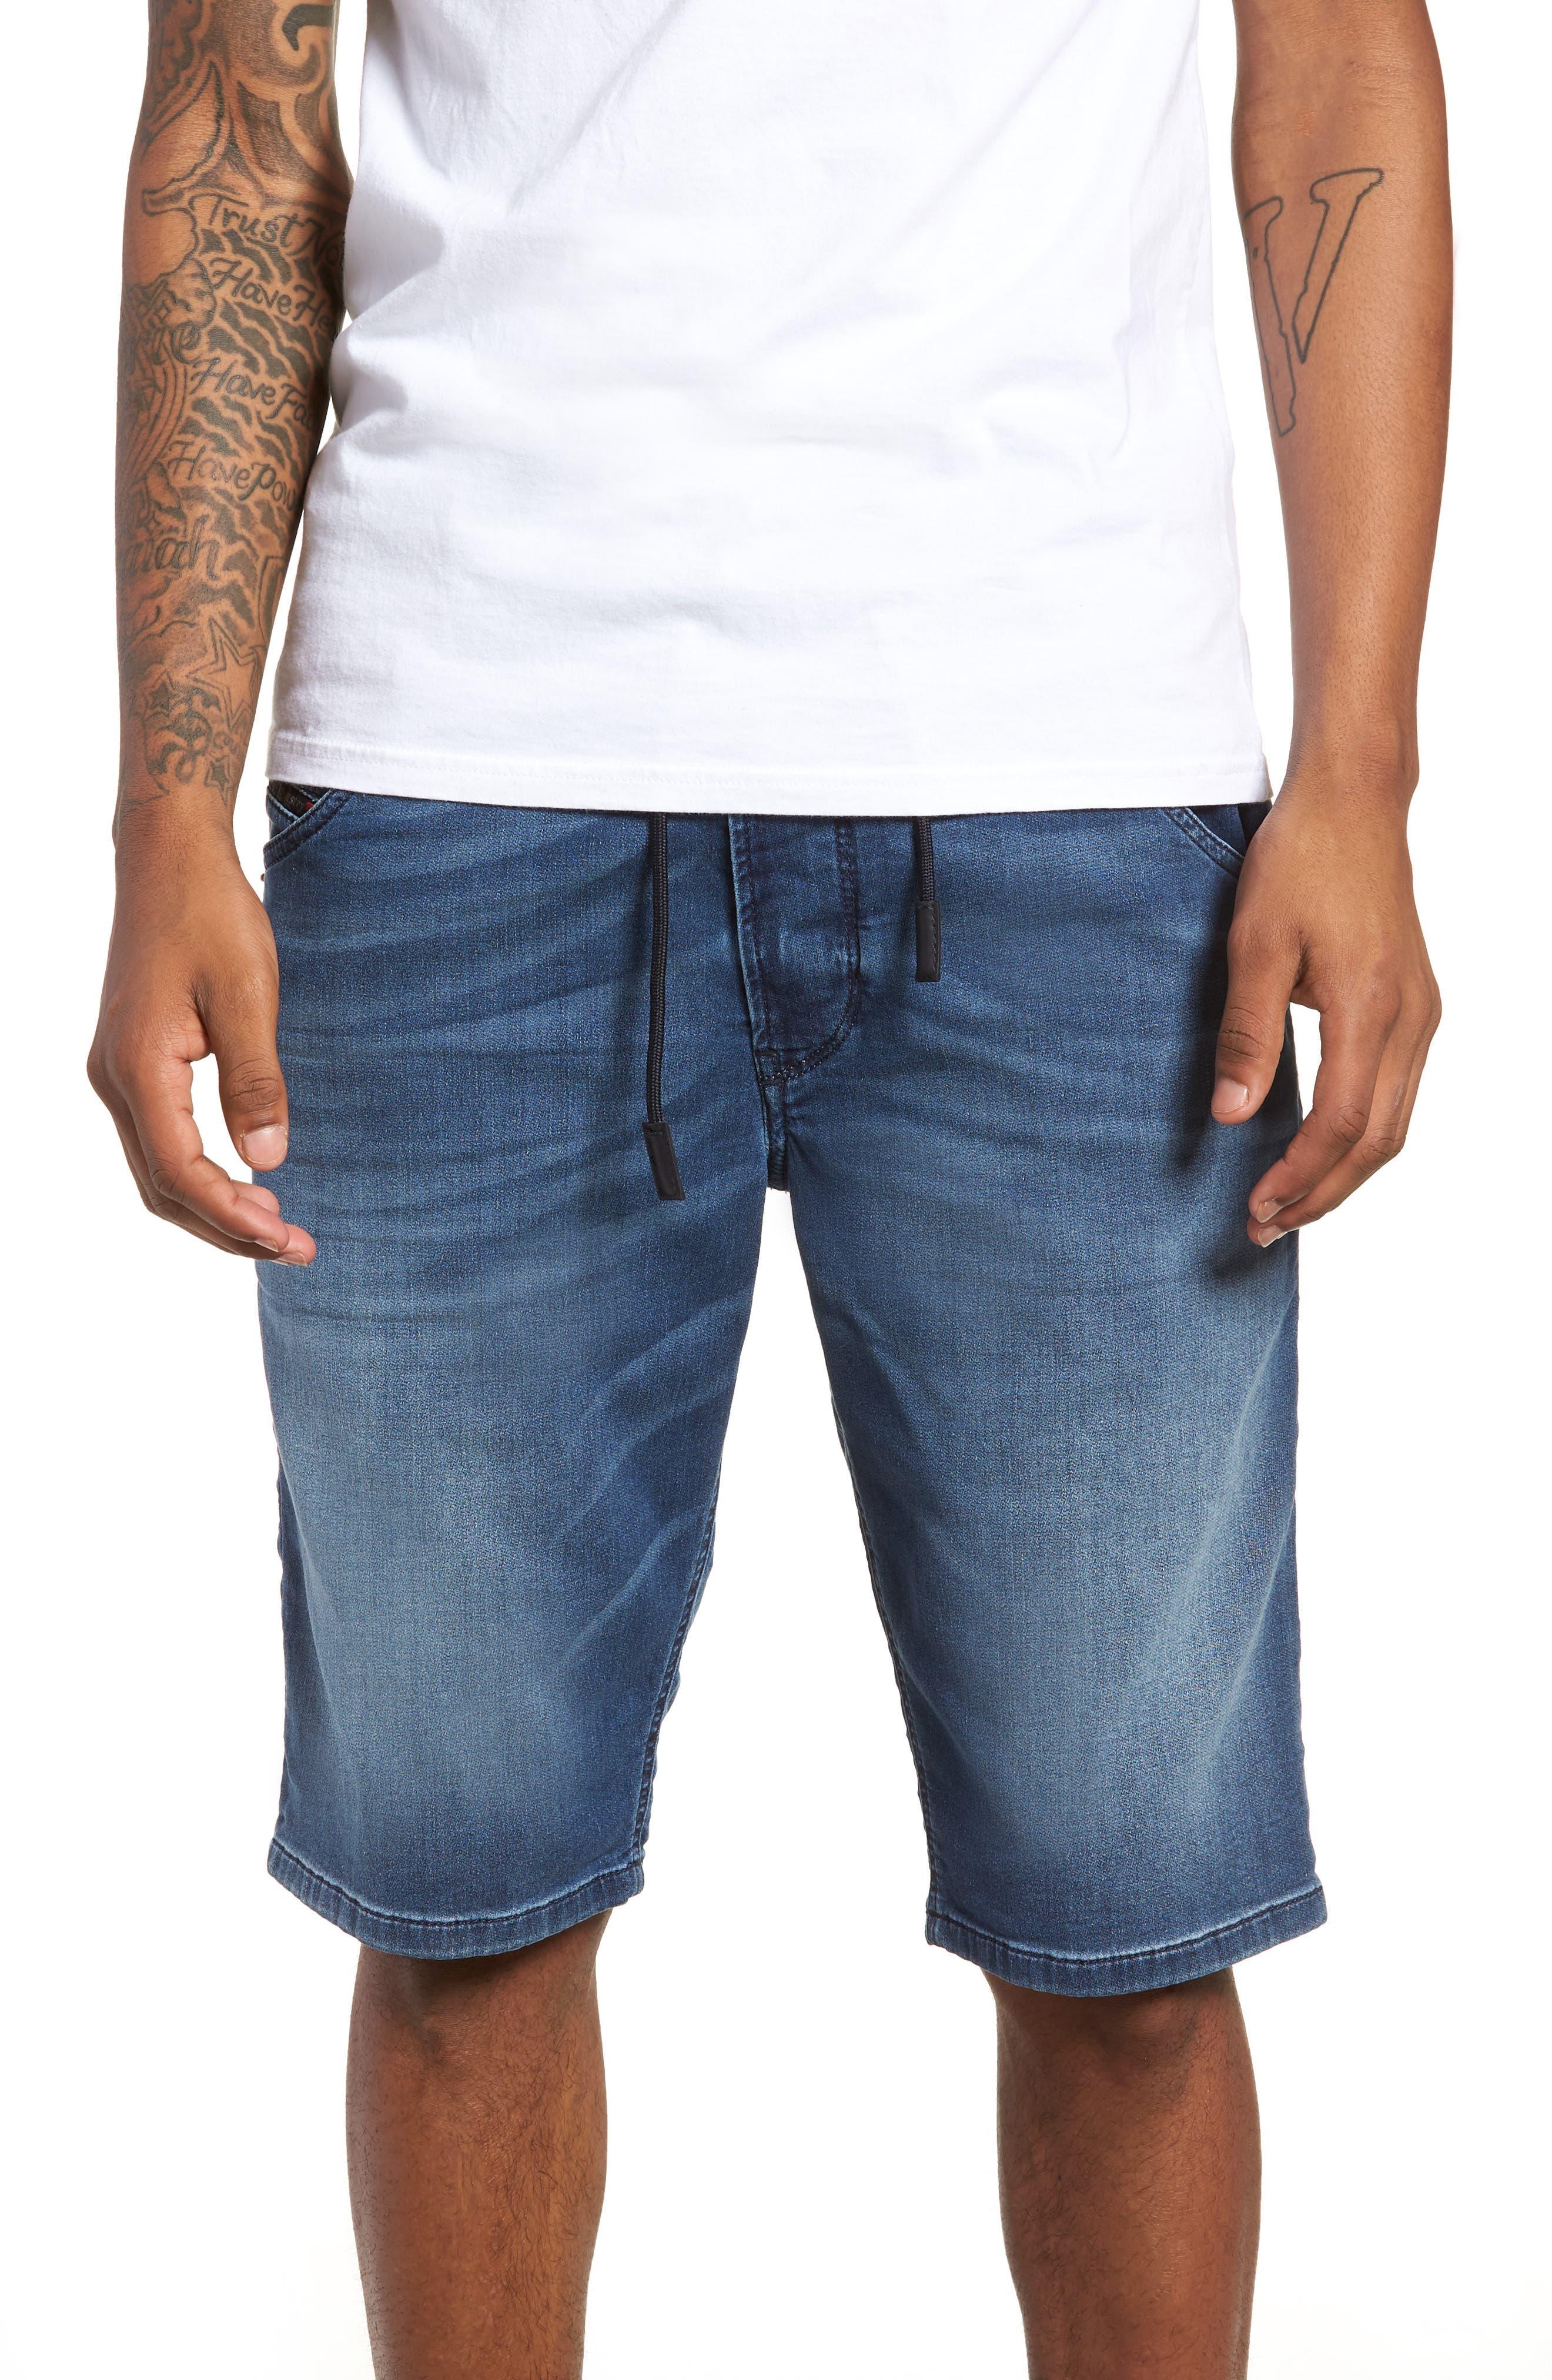 Krooshort Denim Shorts,                         Main,                         color, 0687C